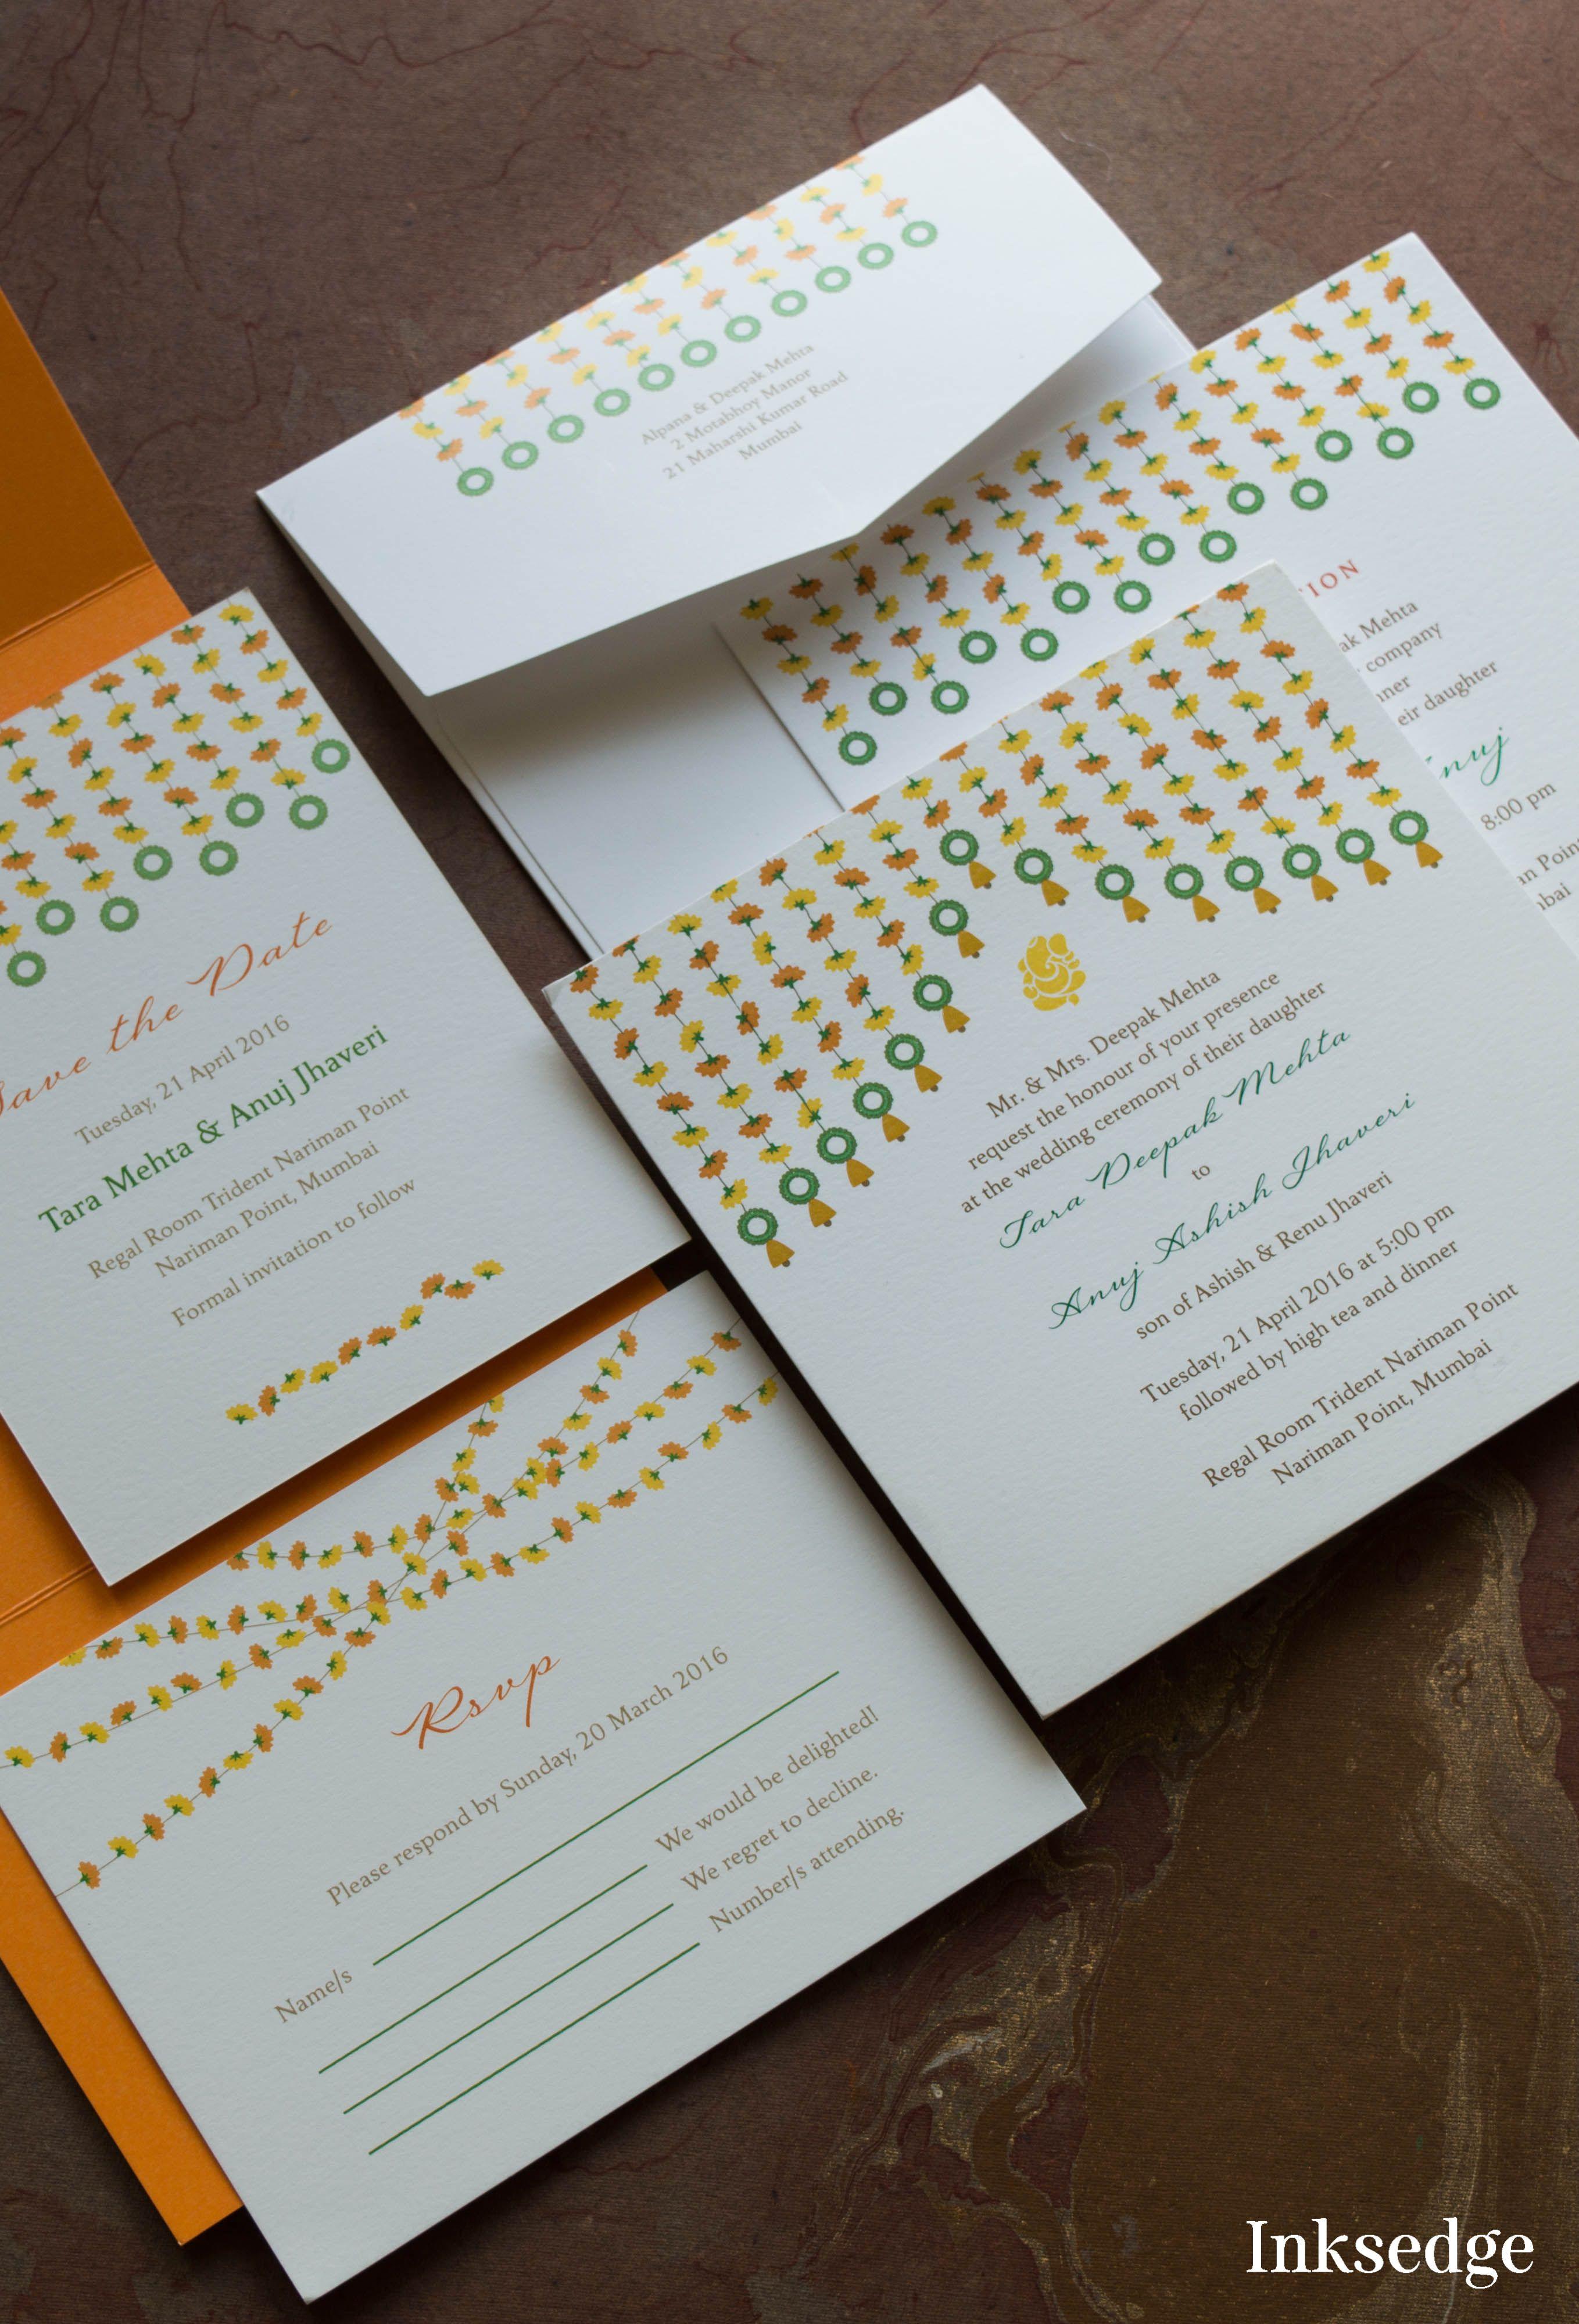 indian wedding invitation mumbai%0A Wedding Invitations  Cards  Invitations  Invites  Wedding Stationery   Customized invitations  Custom made Cards  Custom Invites  Stationery   Design u